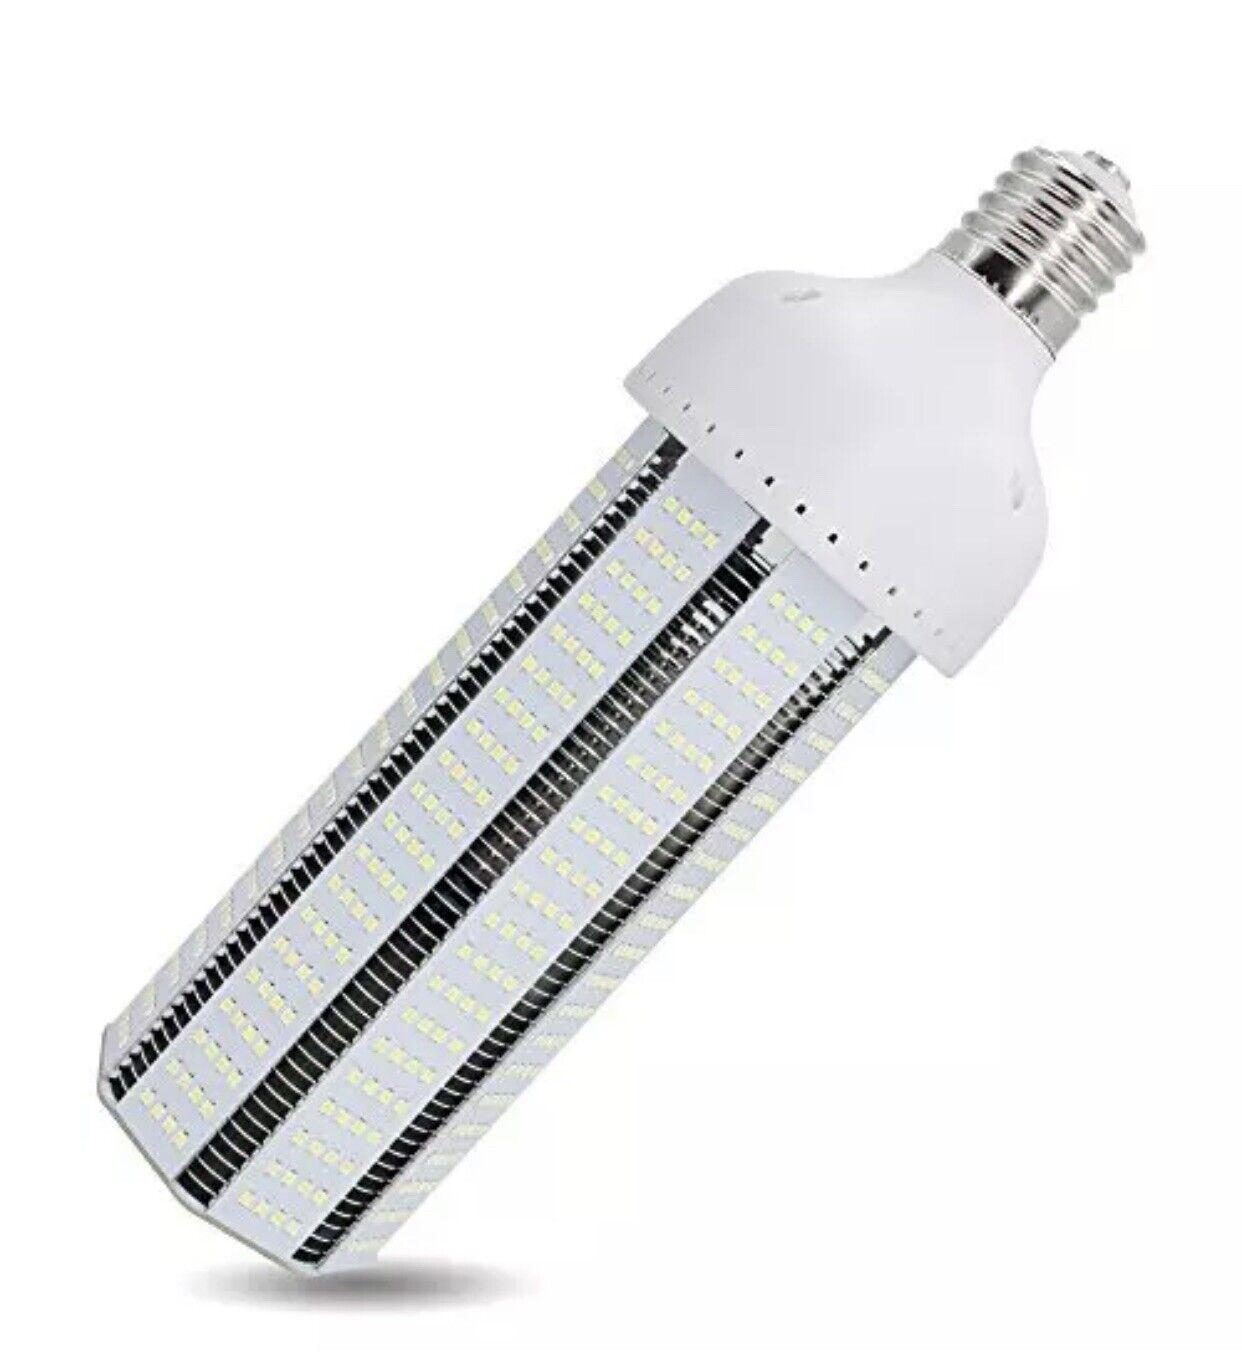 YGS-Tech LED Corn Light E40 Base 12500 Lumen Daylight White 6500K Bulb